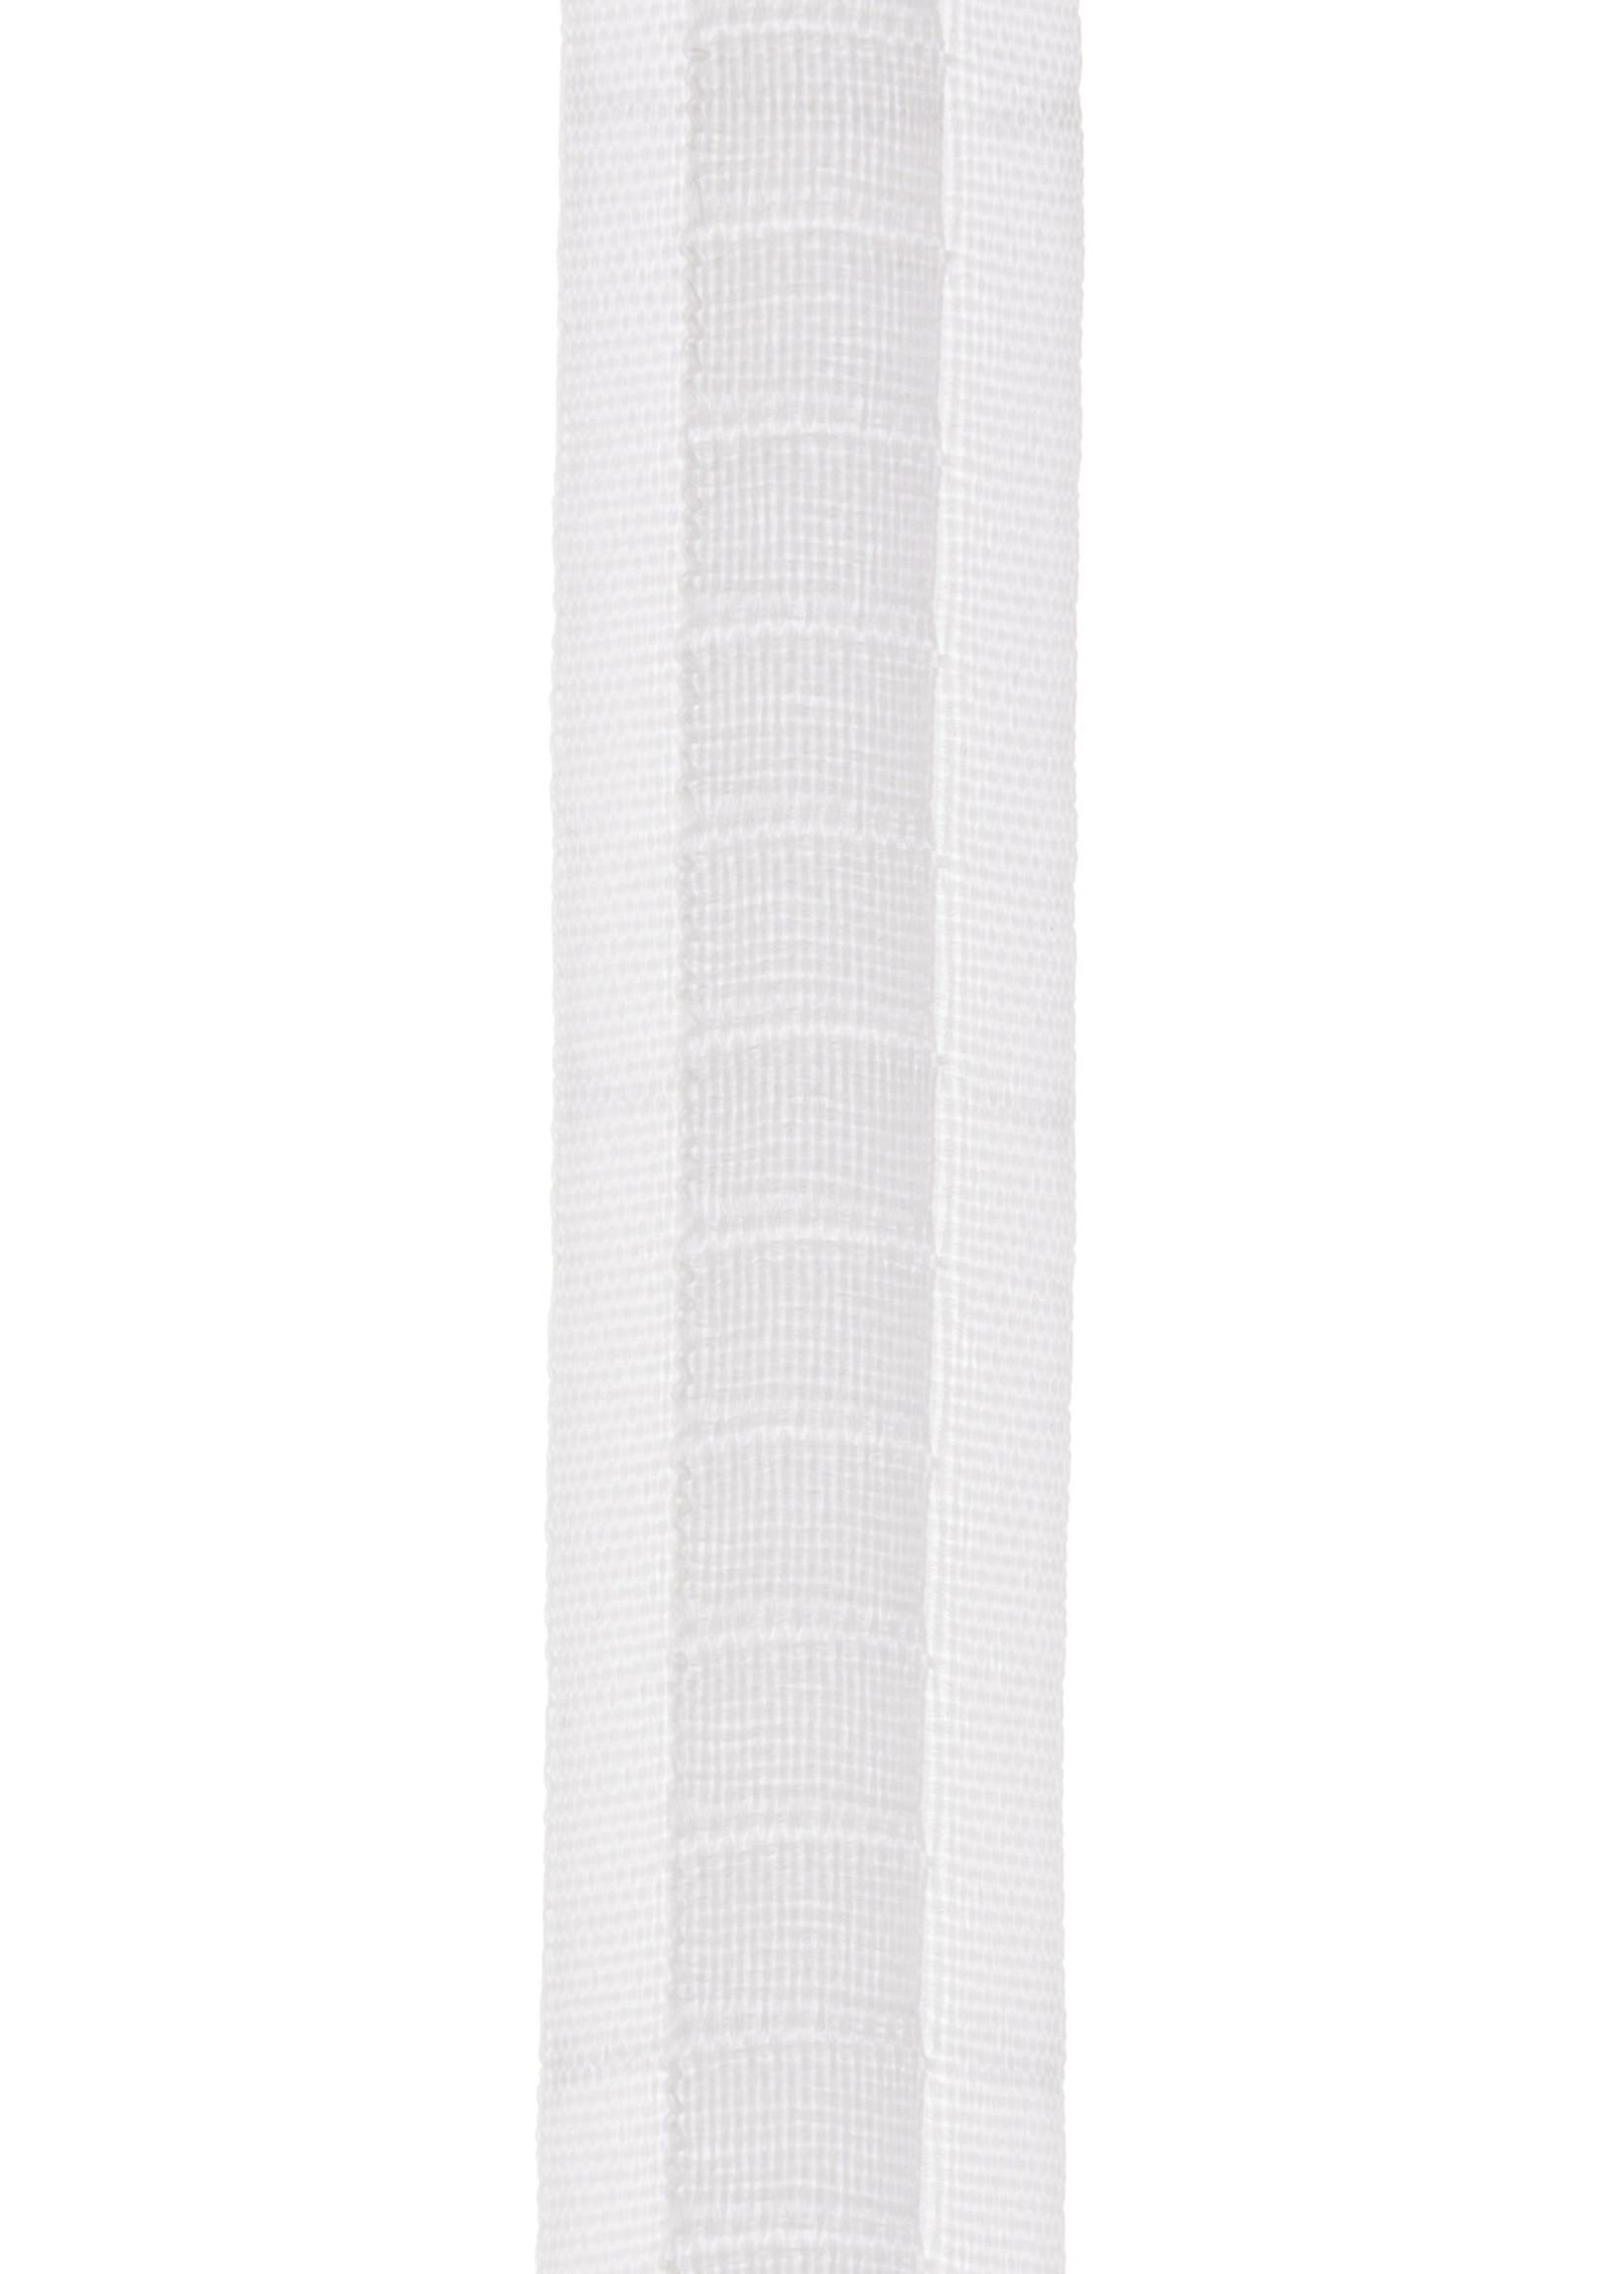 Duplo gordijnplooiband 10 meter